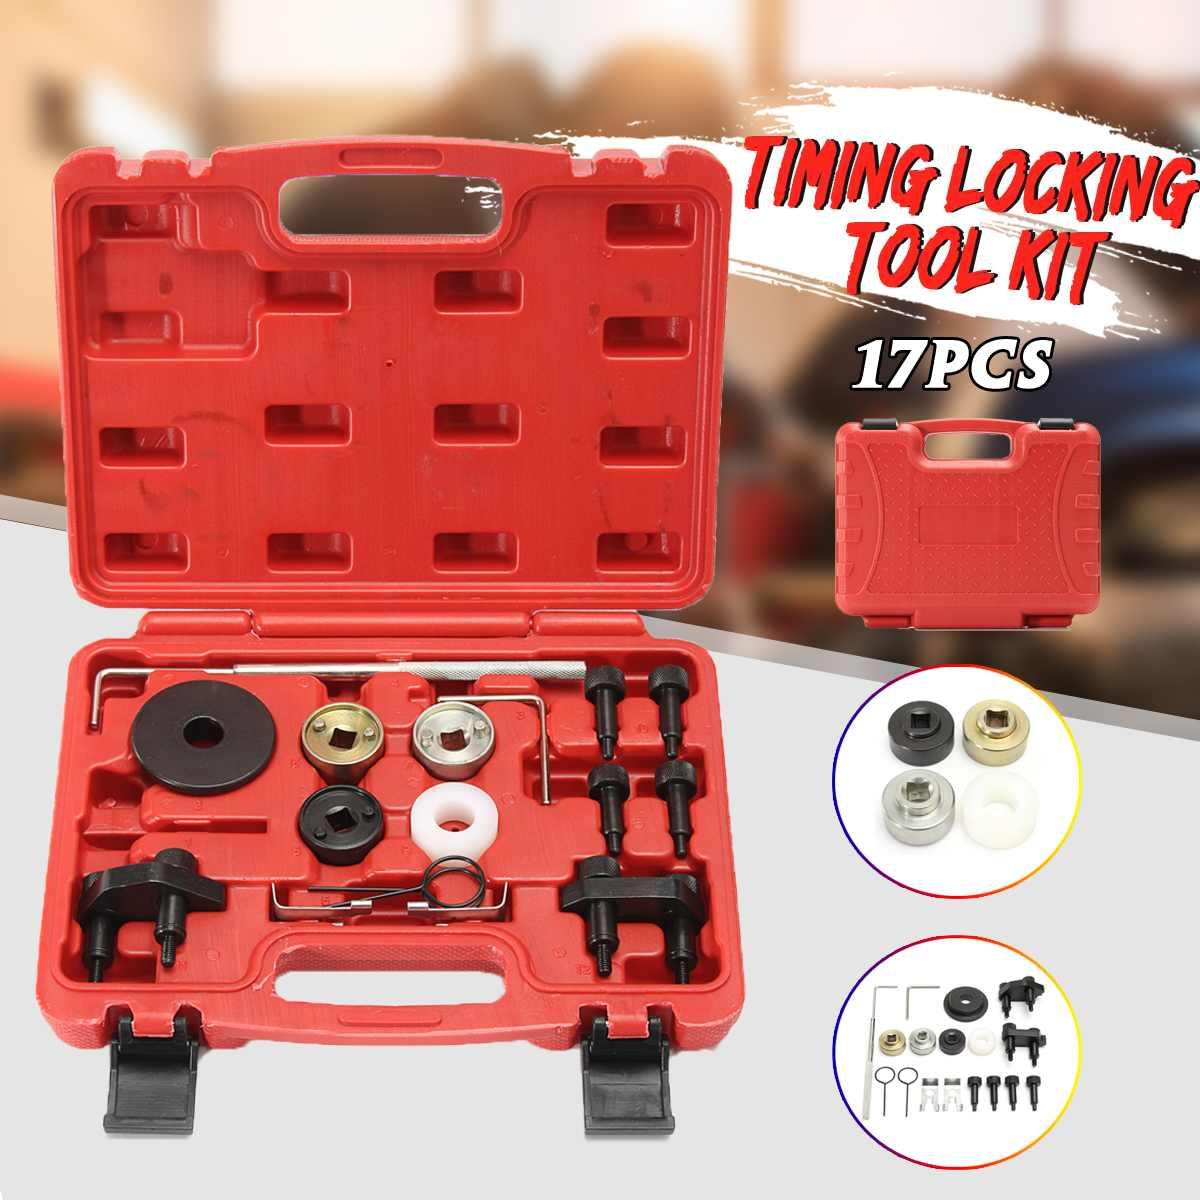 Universal Car Engine Cam Timing Locking Tool Set 2008-2013 For AUDI For VW 2.0 Turbo Tfsi Eos Gti A3 A4 A5 A6 Q5 Engine Care